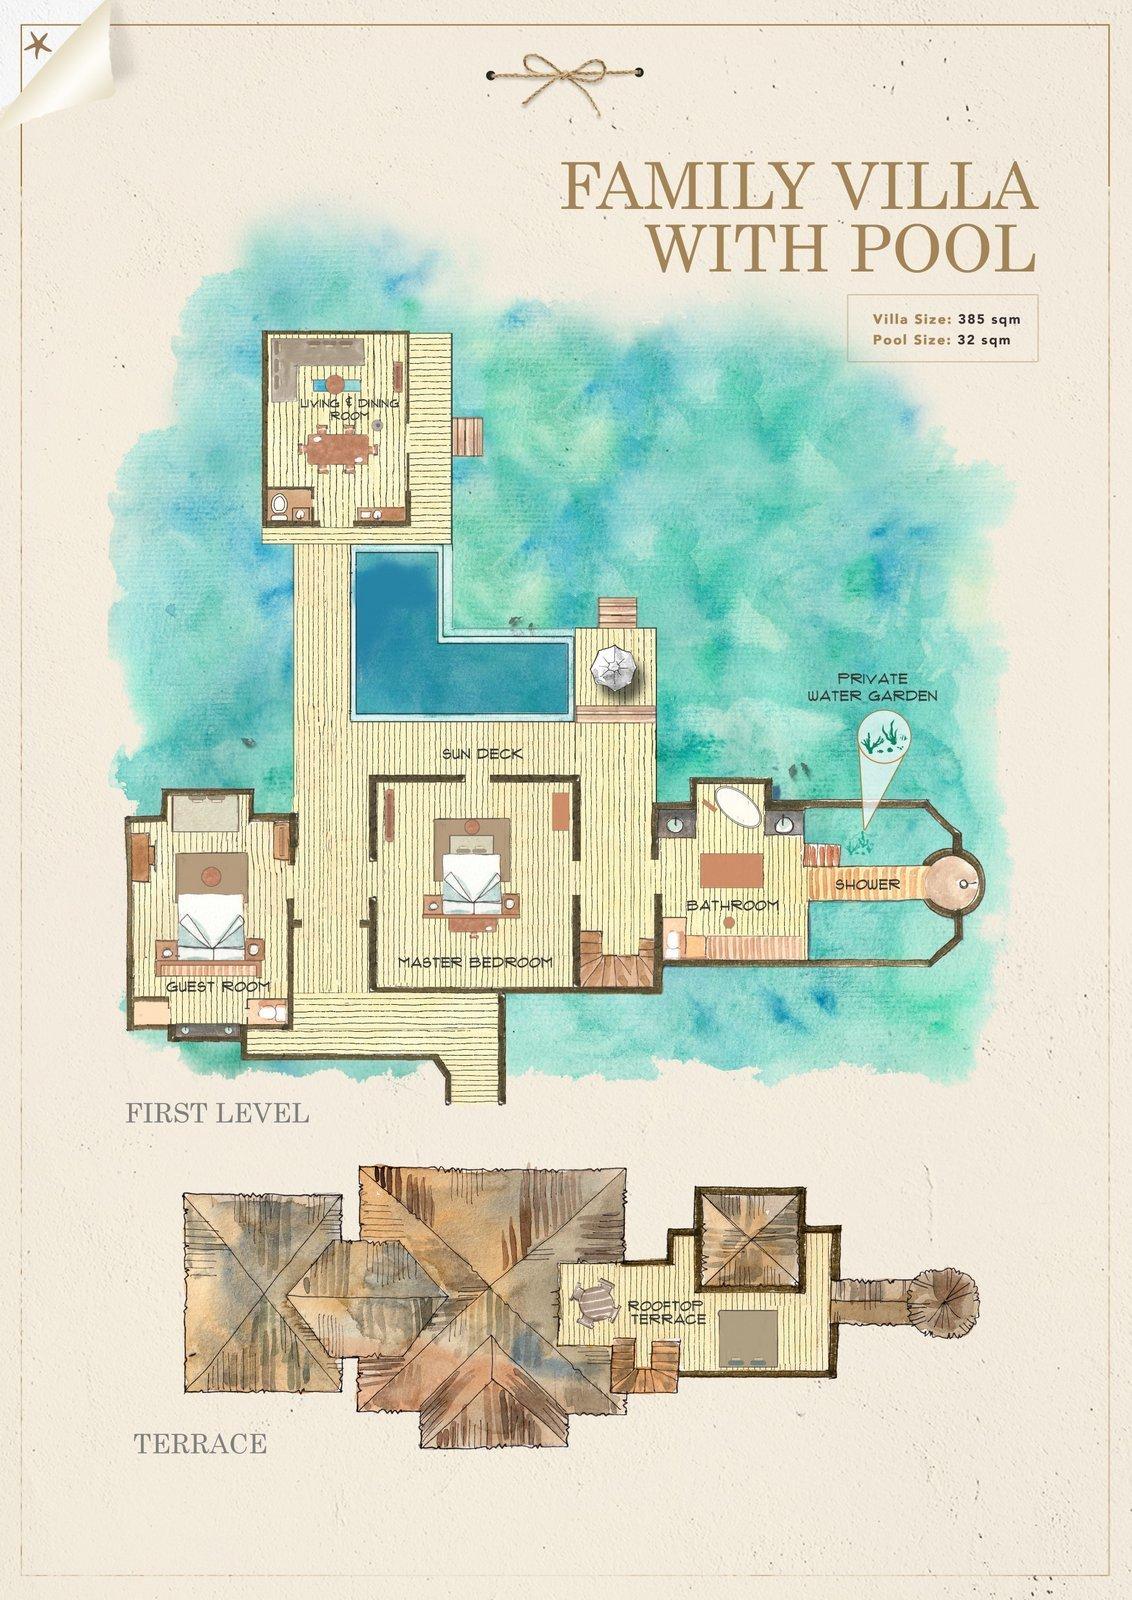 Мальдивы, отель Gili Lankanfushi Maldives, план-схема номера Family Villa with Pool